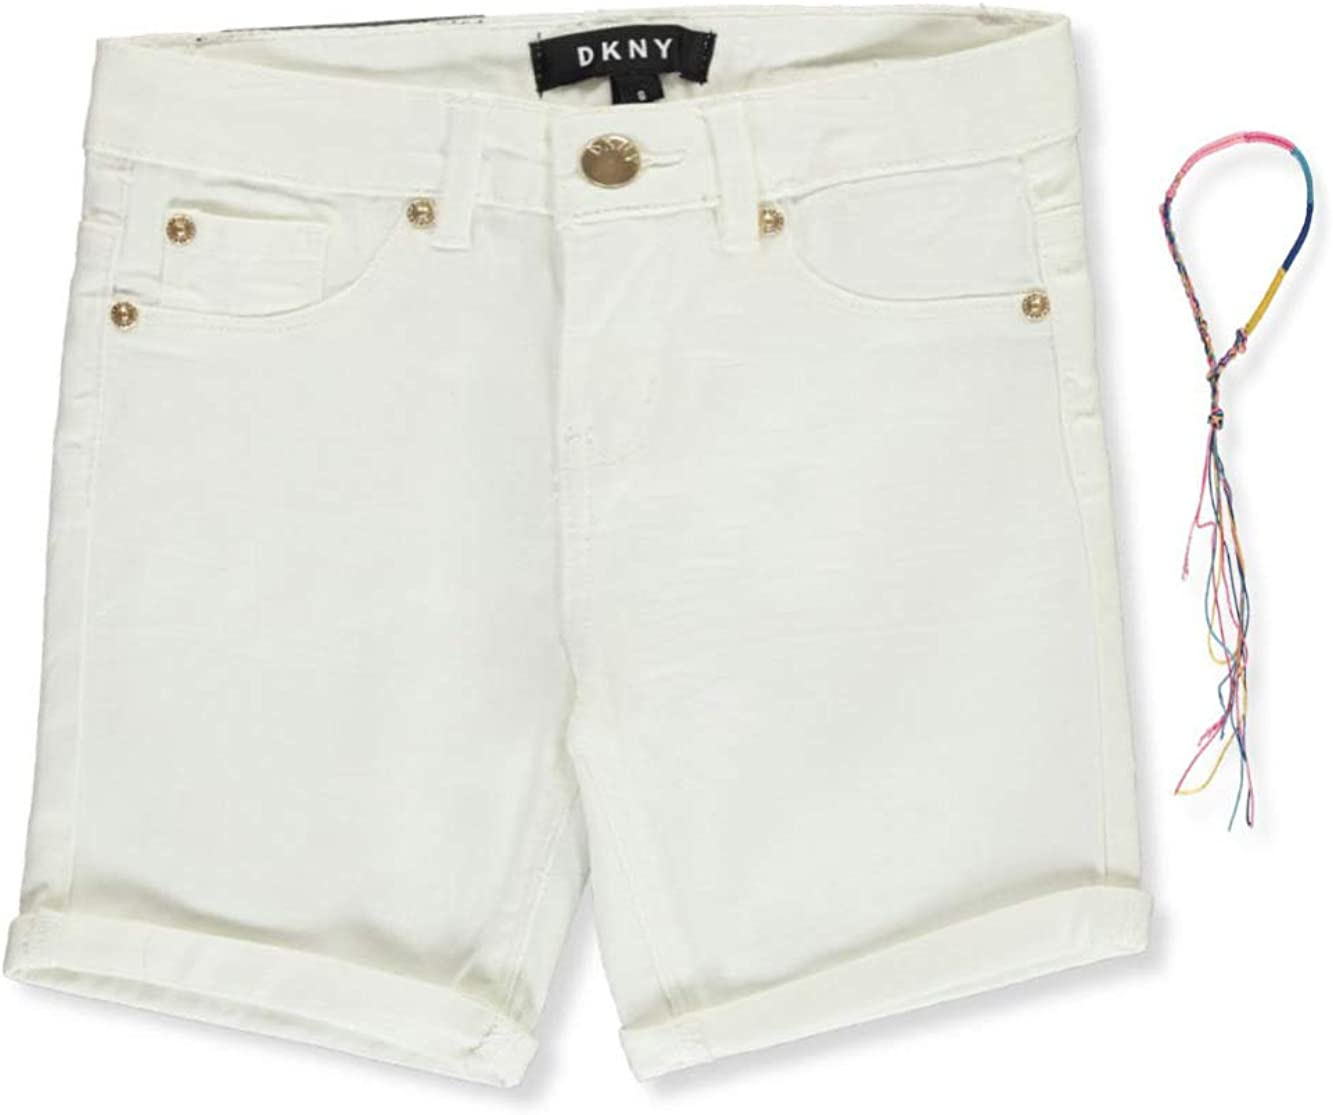 BNWT DKNY Filles Logo Jersey Short Black Kids Activewear gym taille 8 ans £ 50